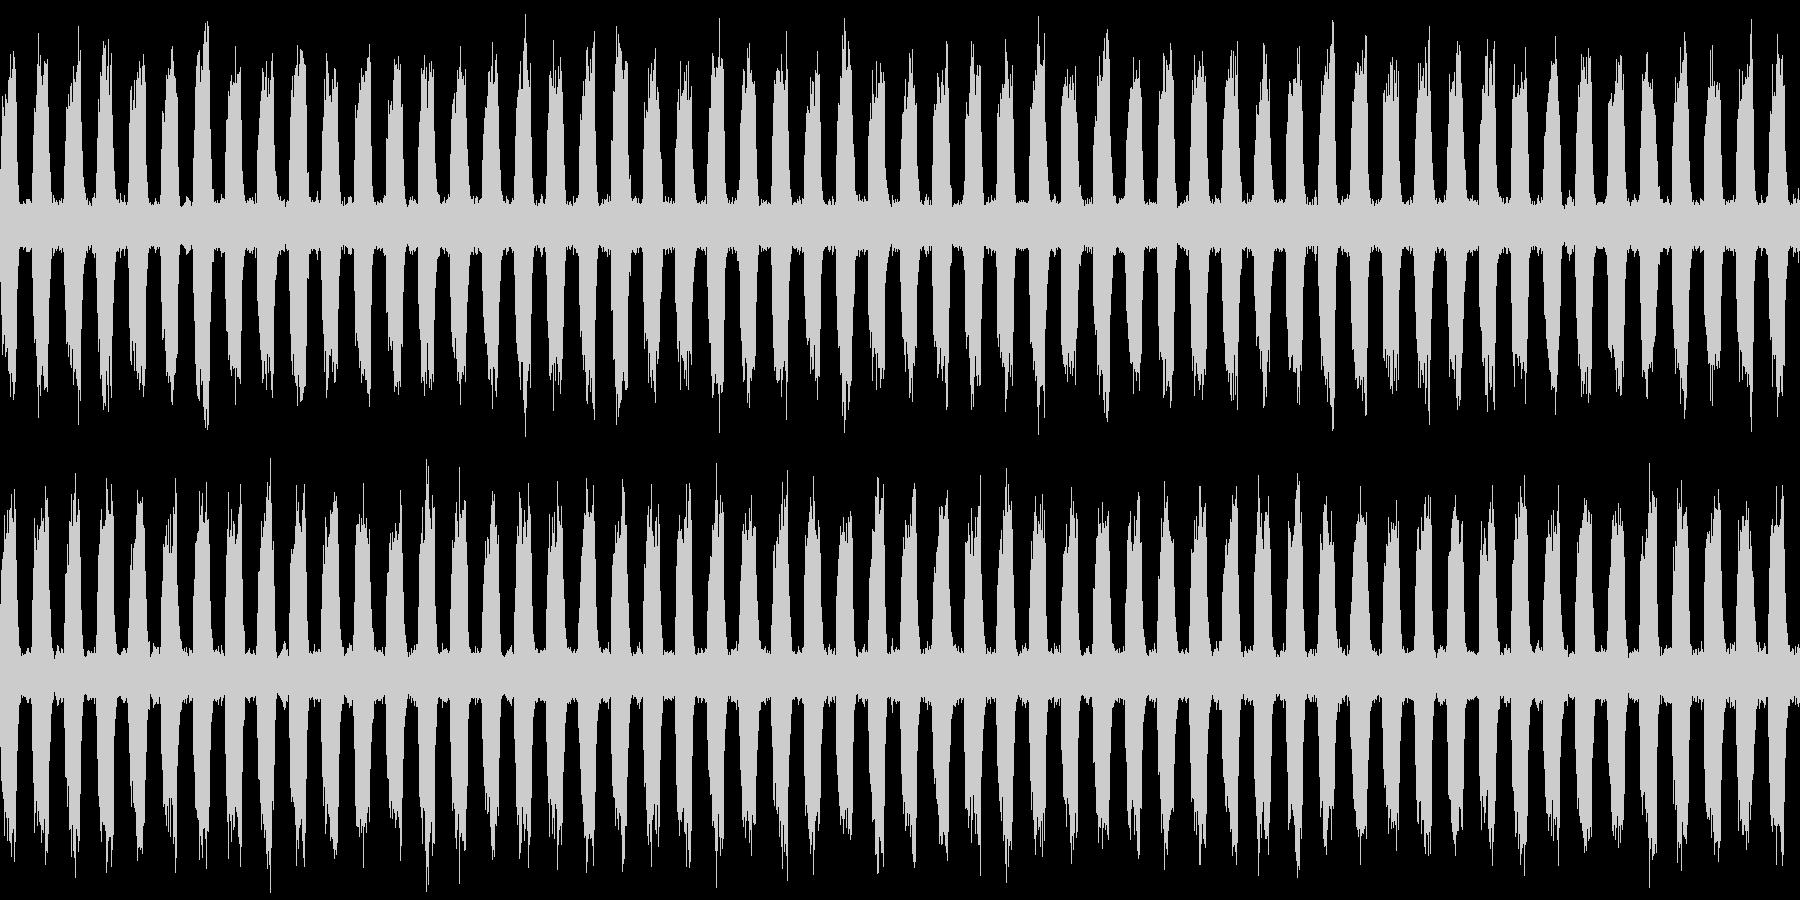 SF_緊急事態_警報_エマージェンシー2の未再生の波形